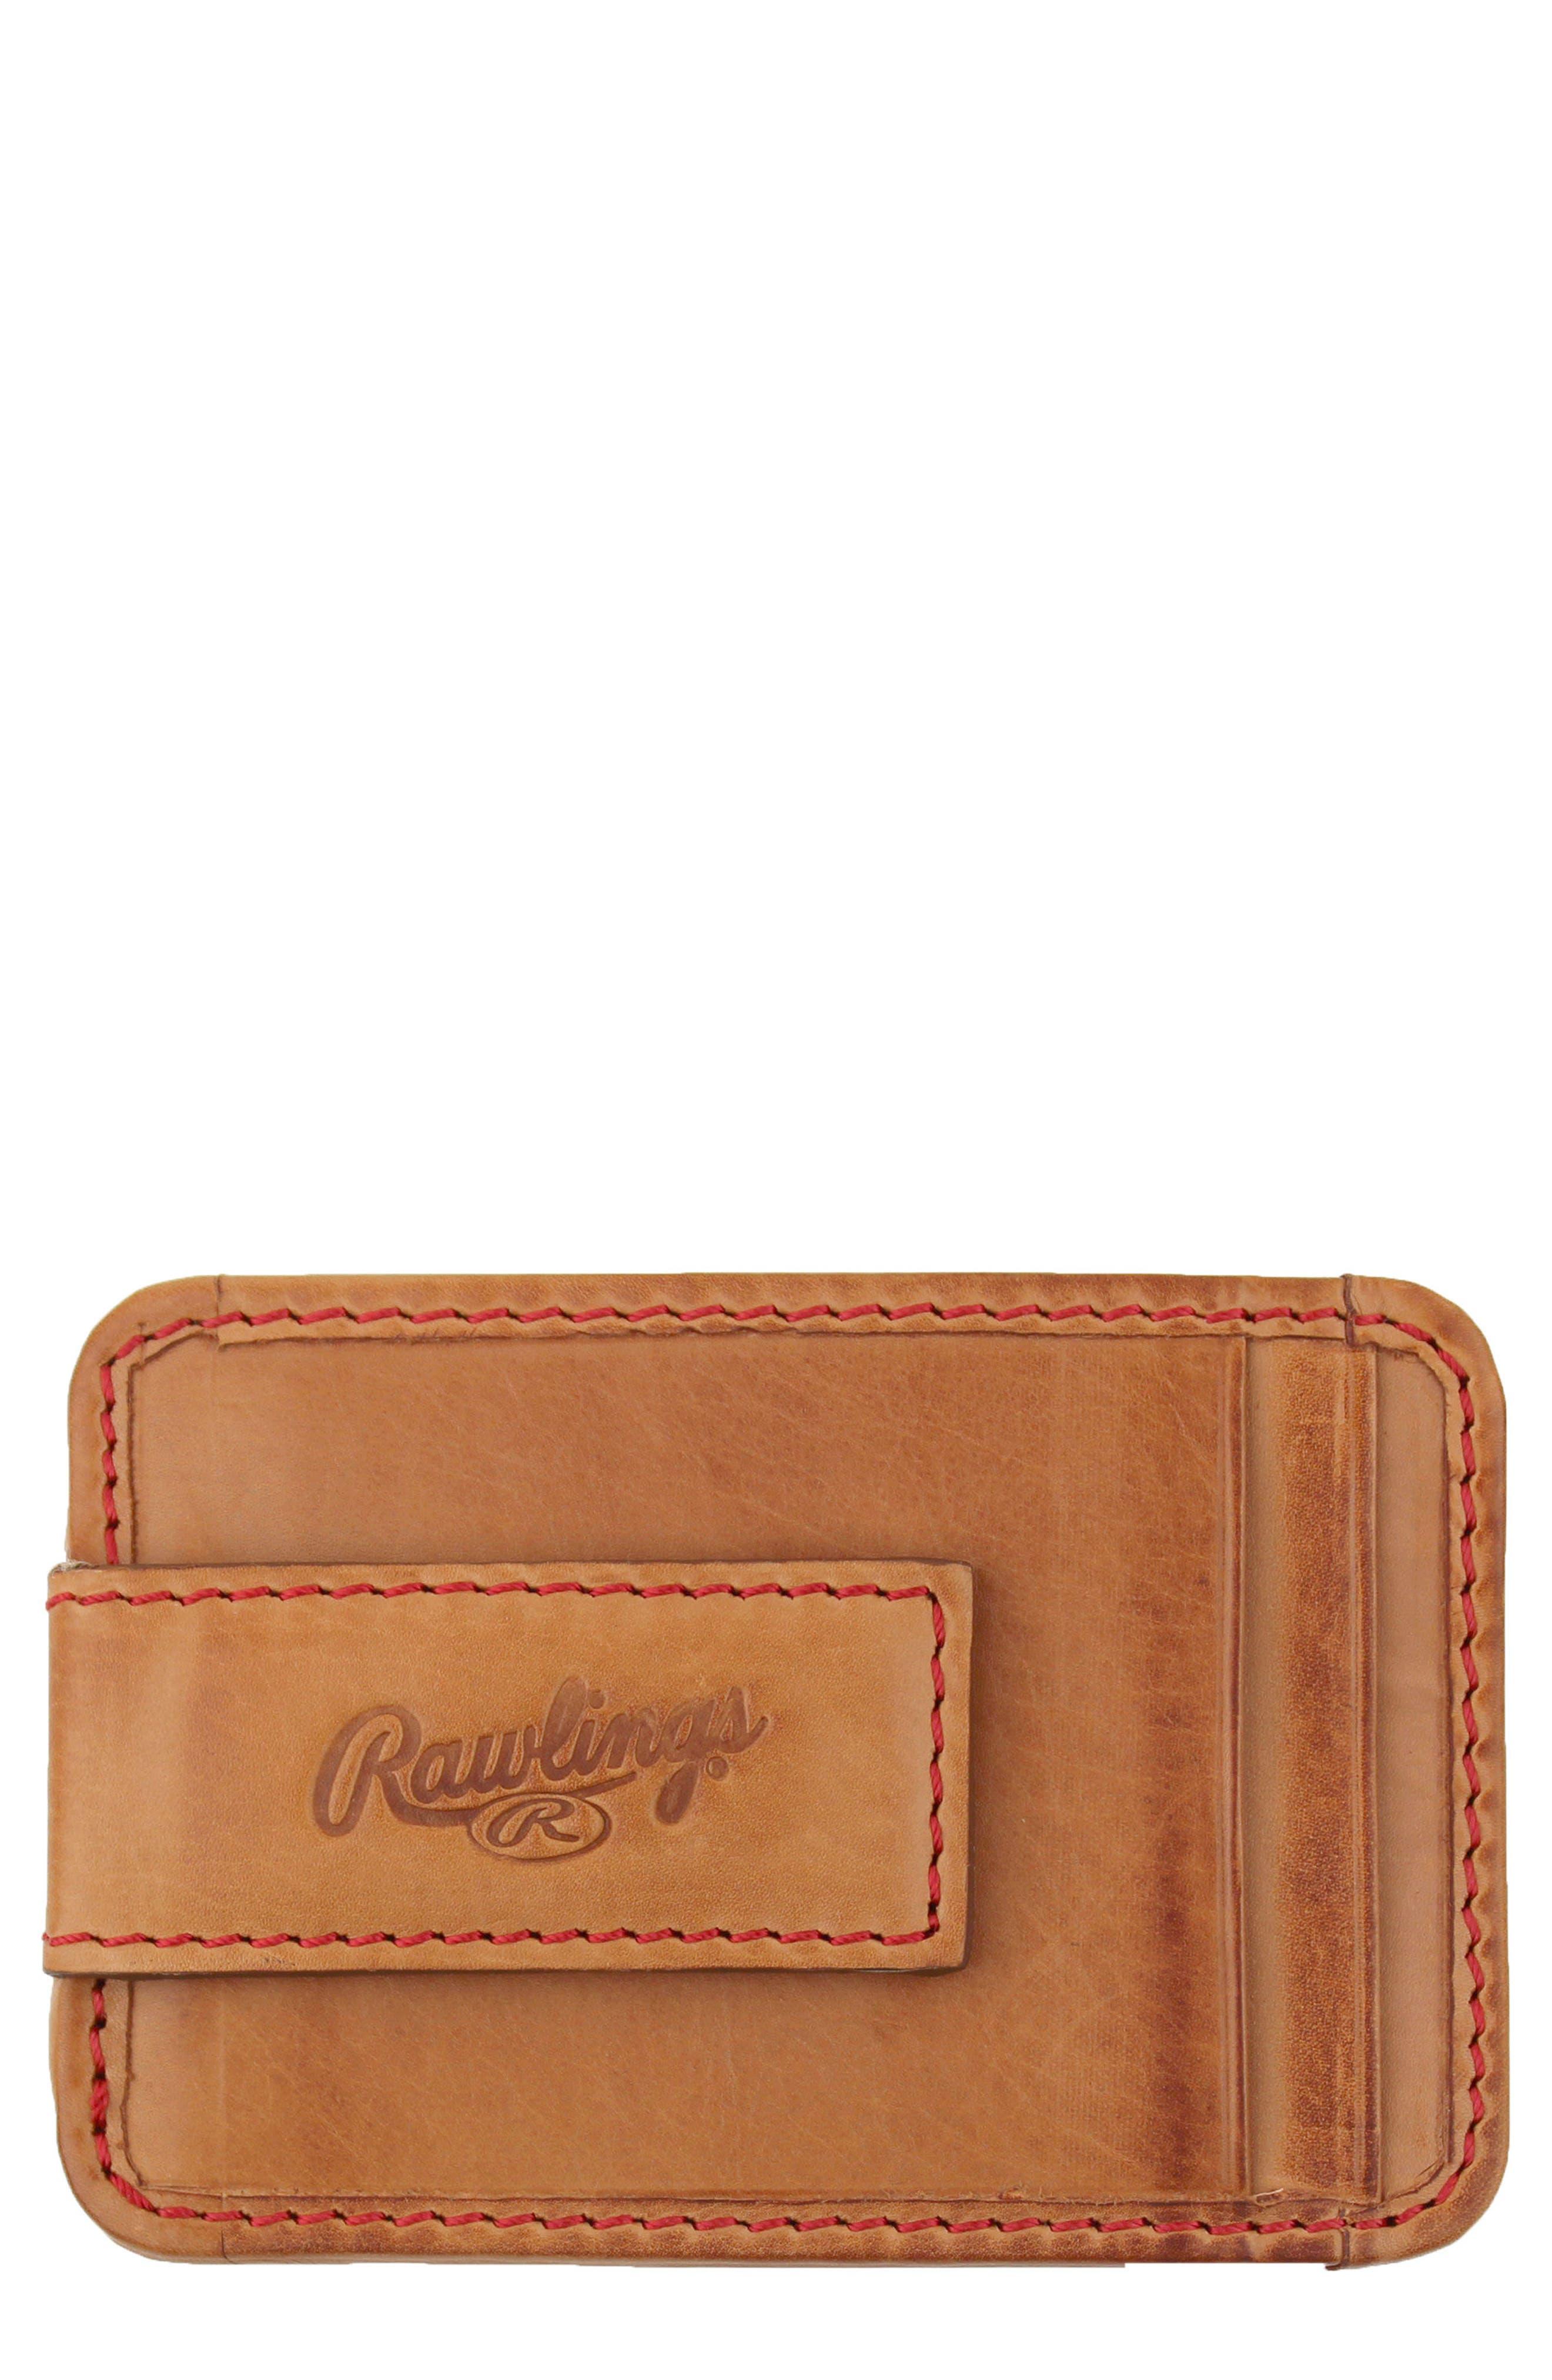 Baseball Stitch Money Clip Card Case,                         Main,                         color,